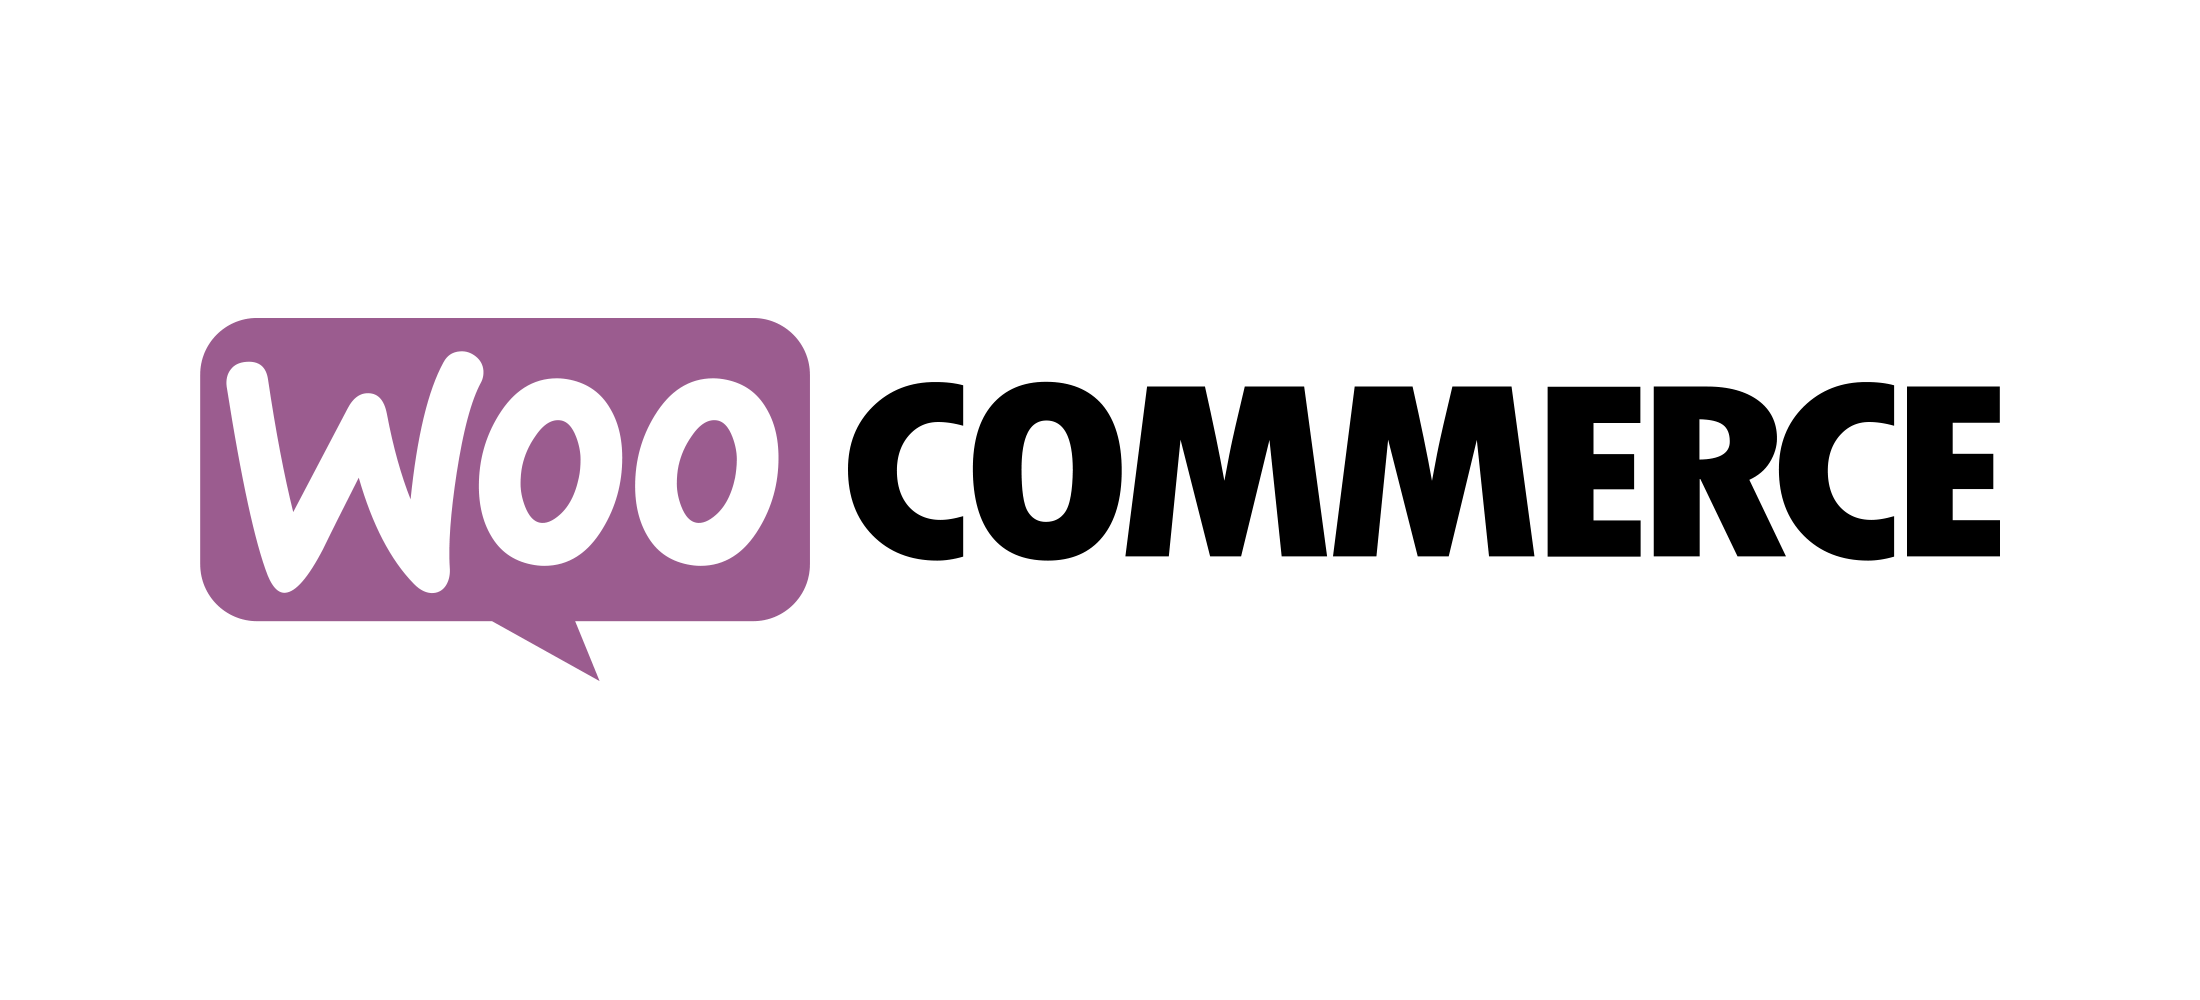 woocommerce-logo-Altheasuite